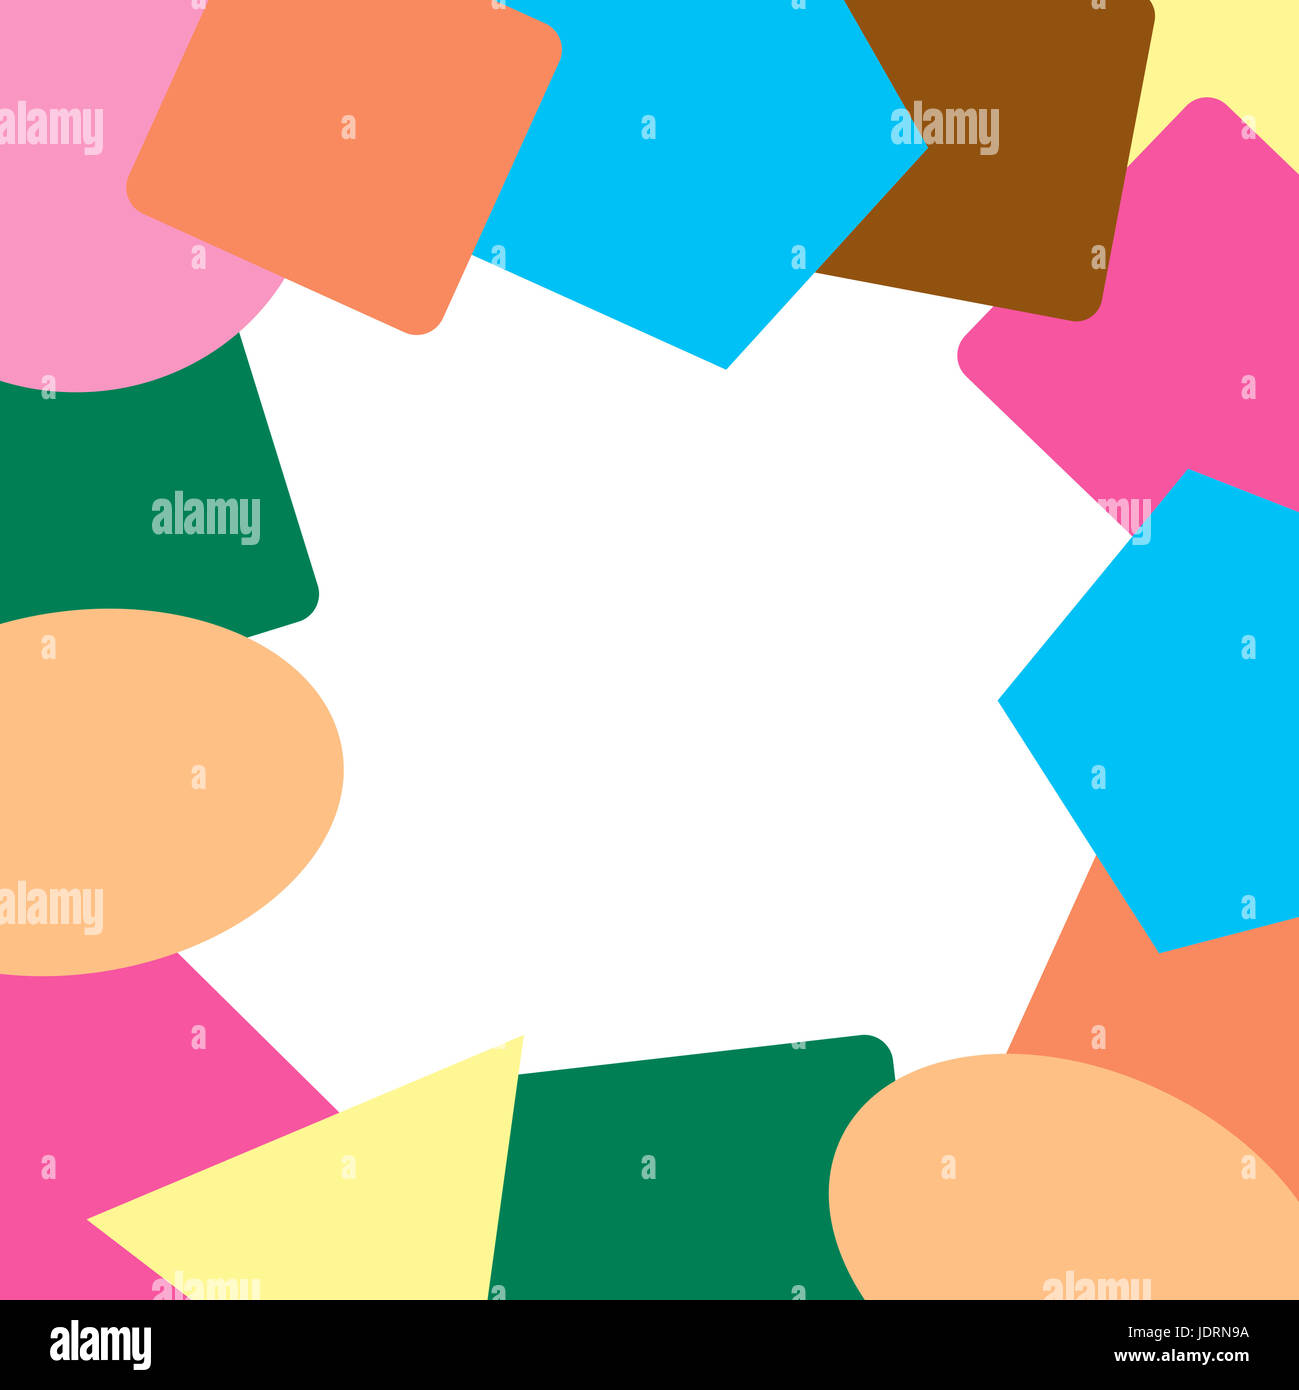 Frame design of geometric shapes Stock Photo: 146195094 - Alamy